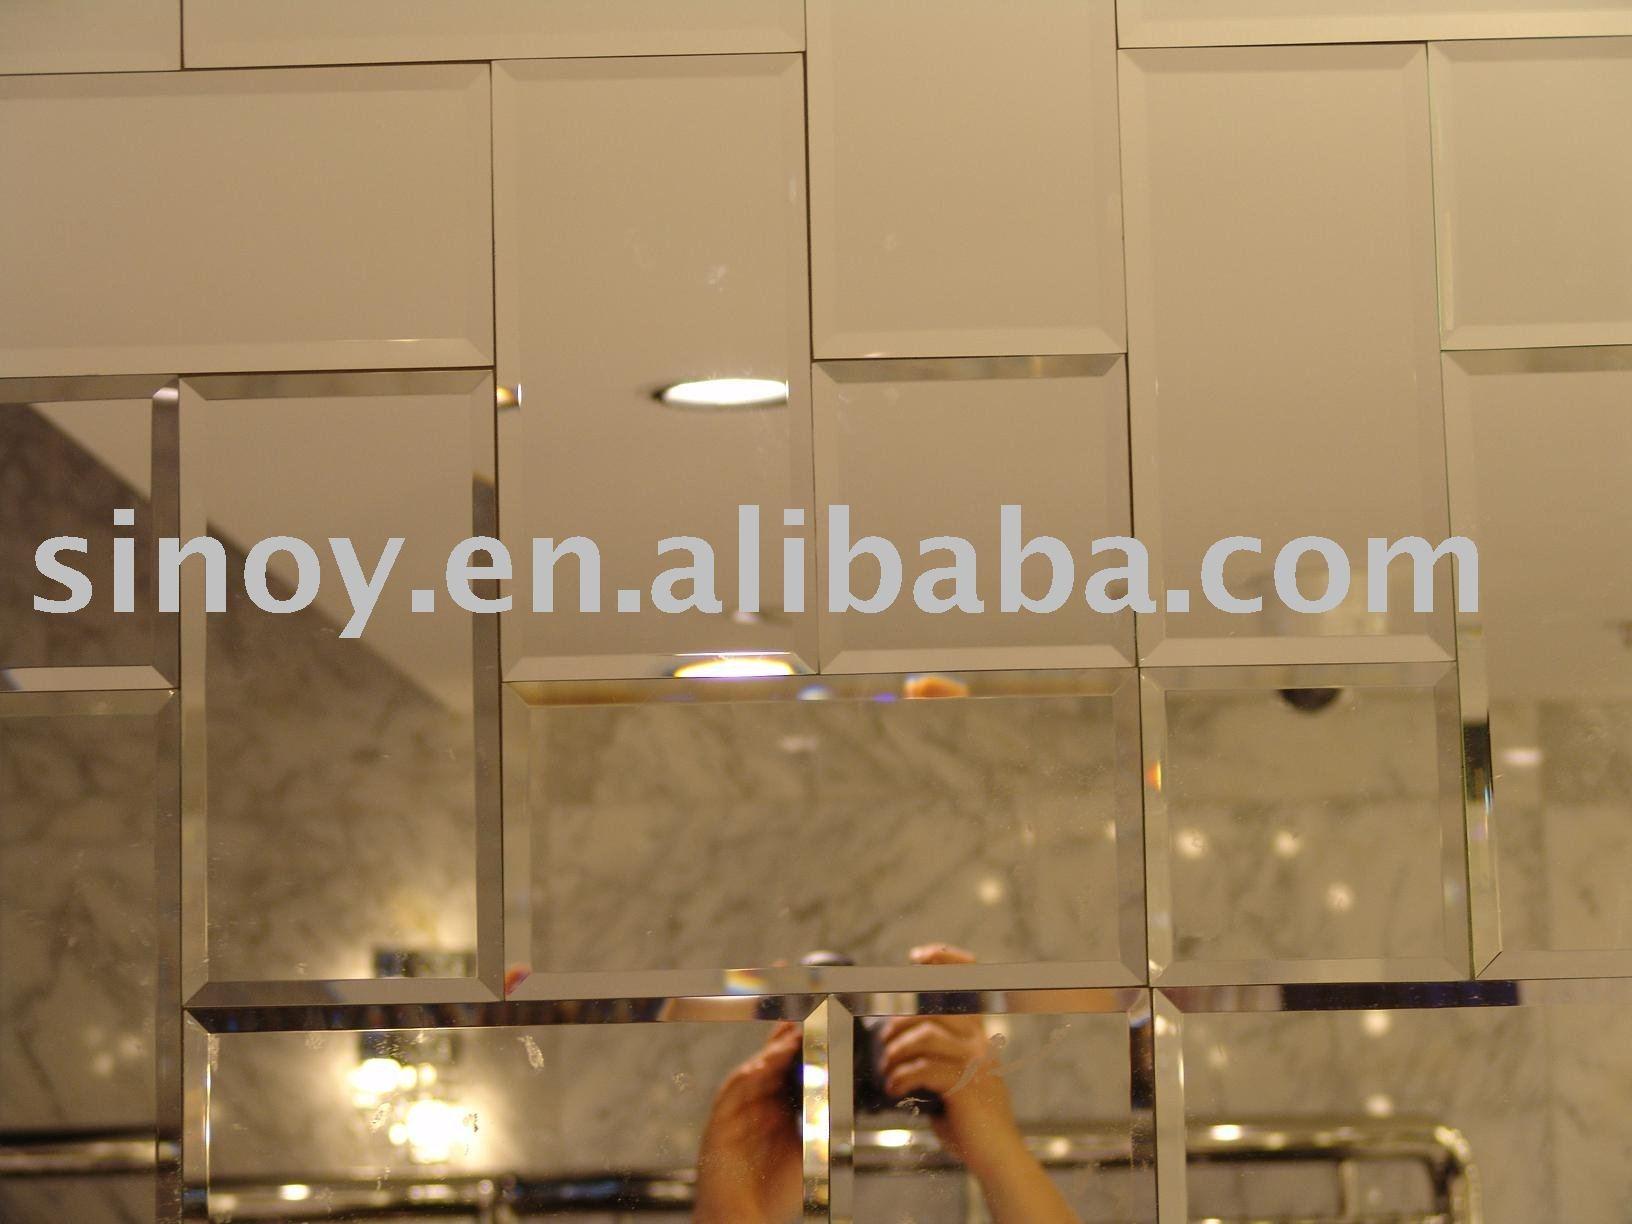 Beveled Bathroom Mirror Tiles 125125mm Buy Beveled Mirror Tiles Regarding Bevel Mirror (Image 3 of 15)